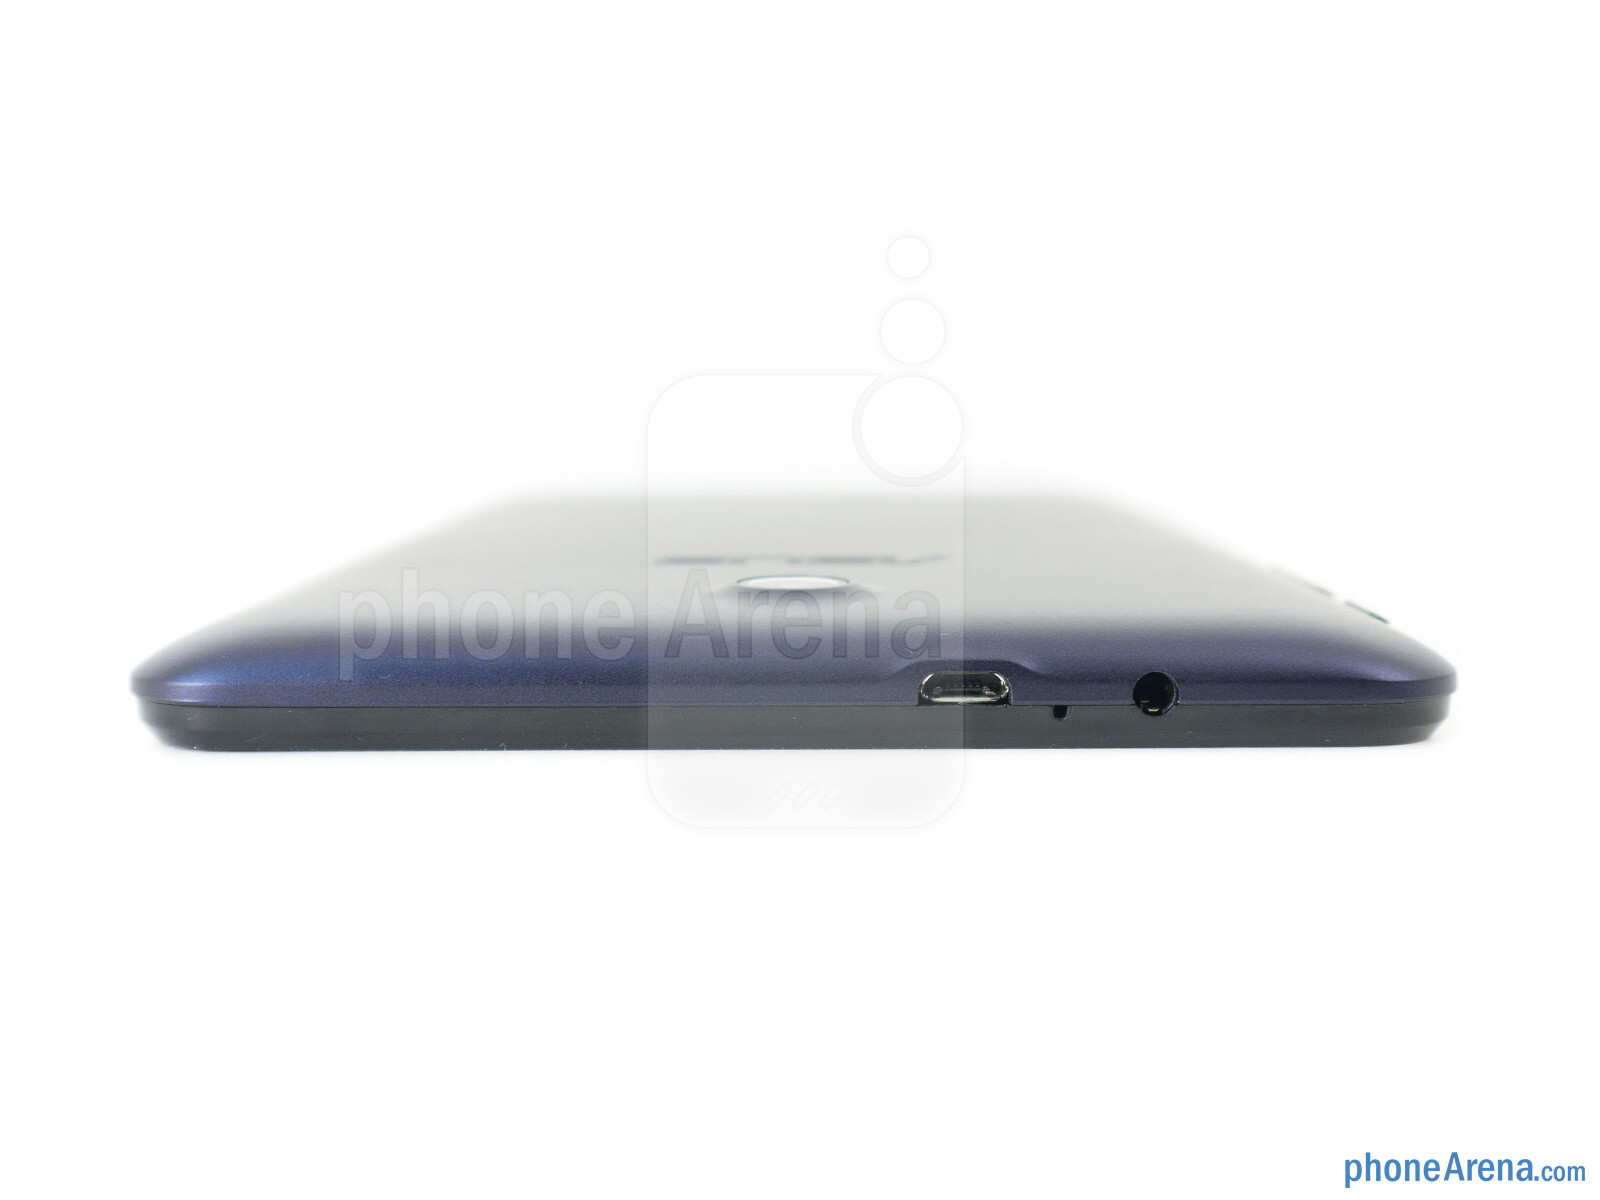 Asus memo pad review 7 : Aquatic center nanaimo